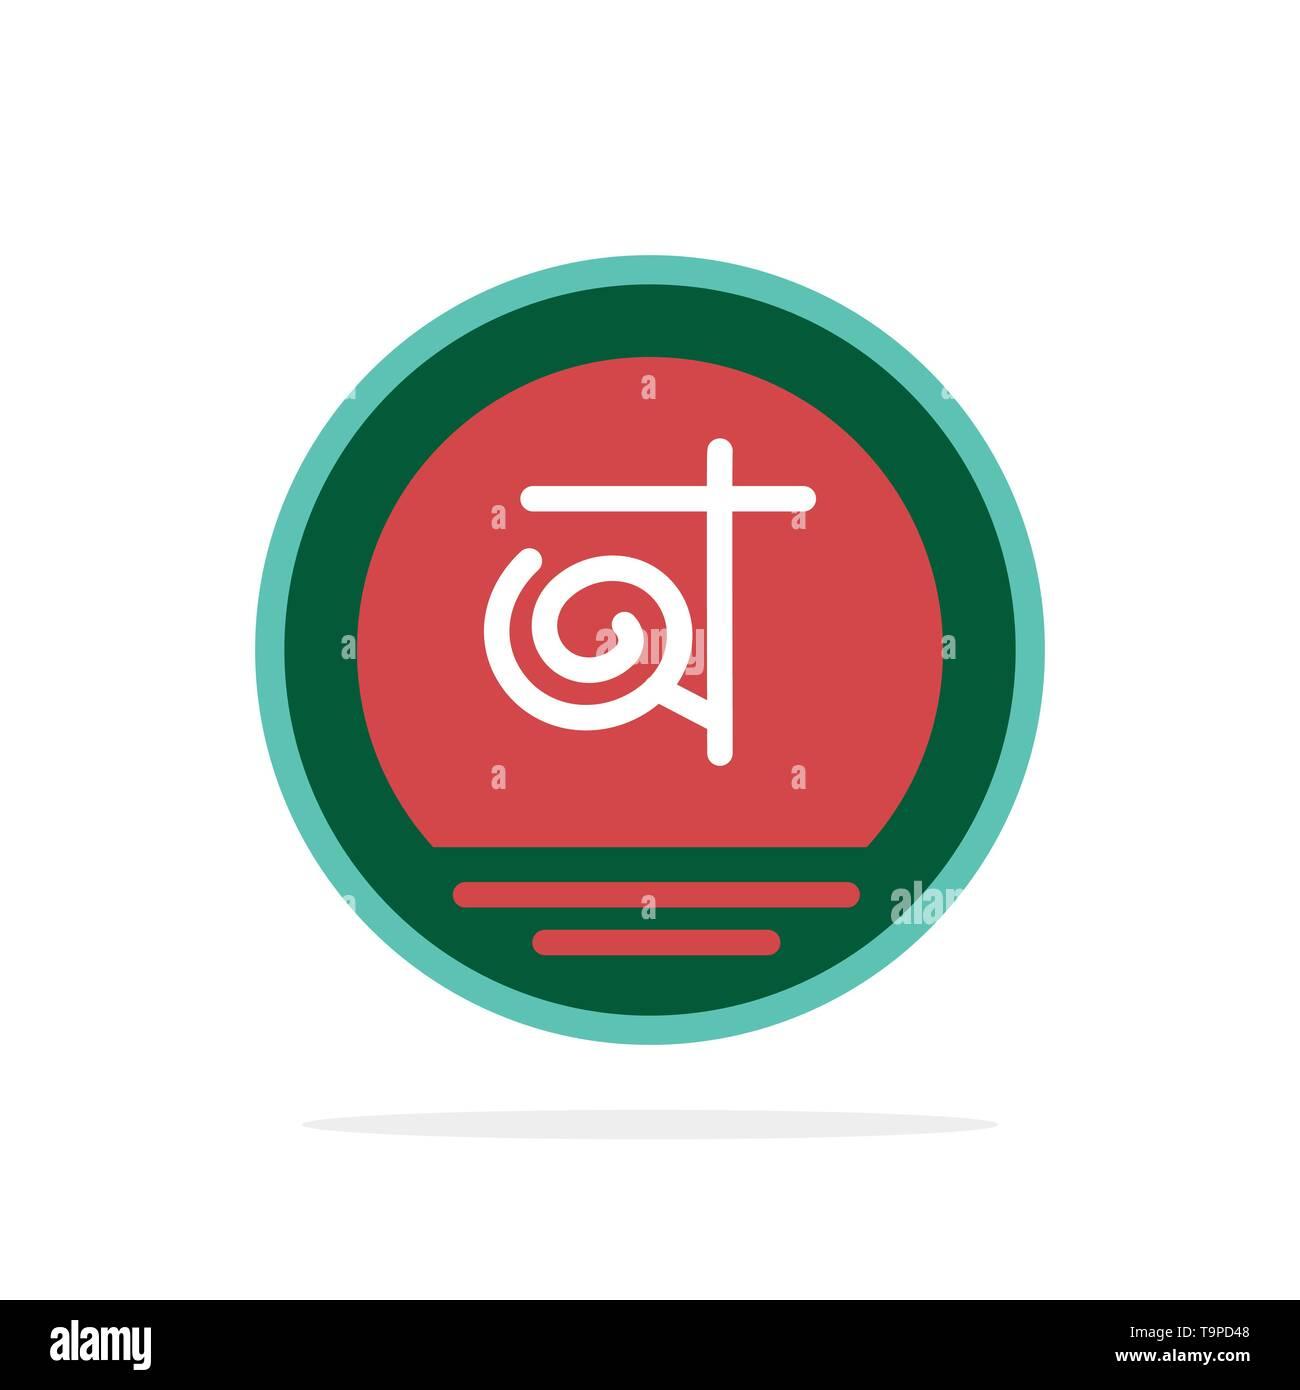 Bangla, Bangladesh, Bangladeshi, Business Abstract Circle Background Flat color Icon - Stock Image